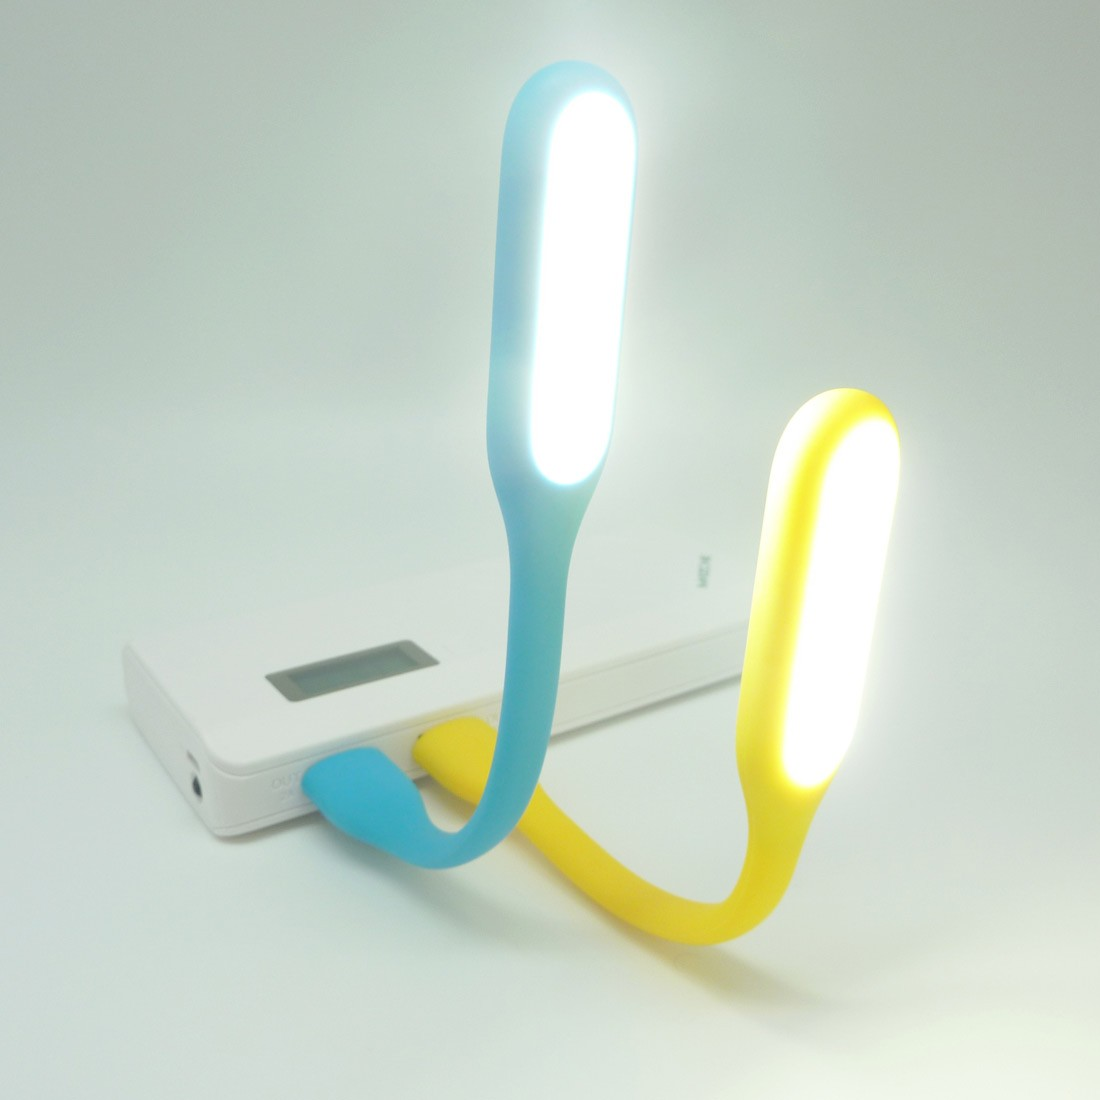 Xelectron Portable Flexible Usb Led Light Lamp Blue